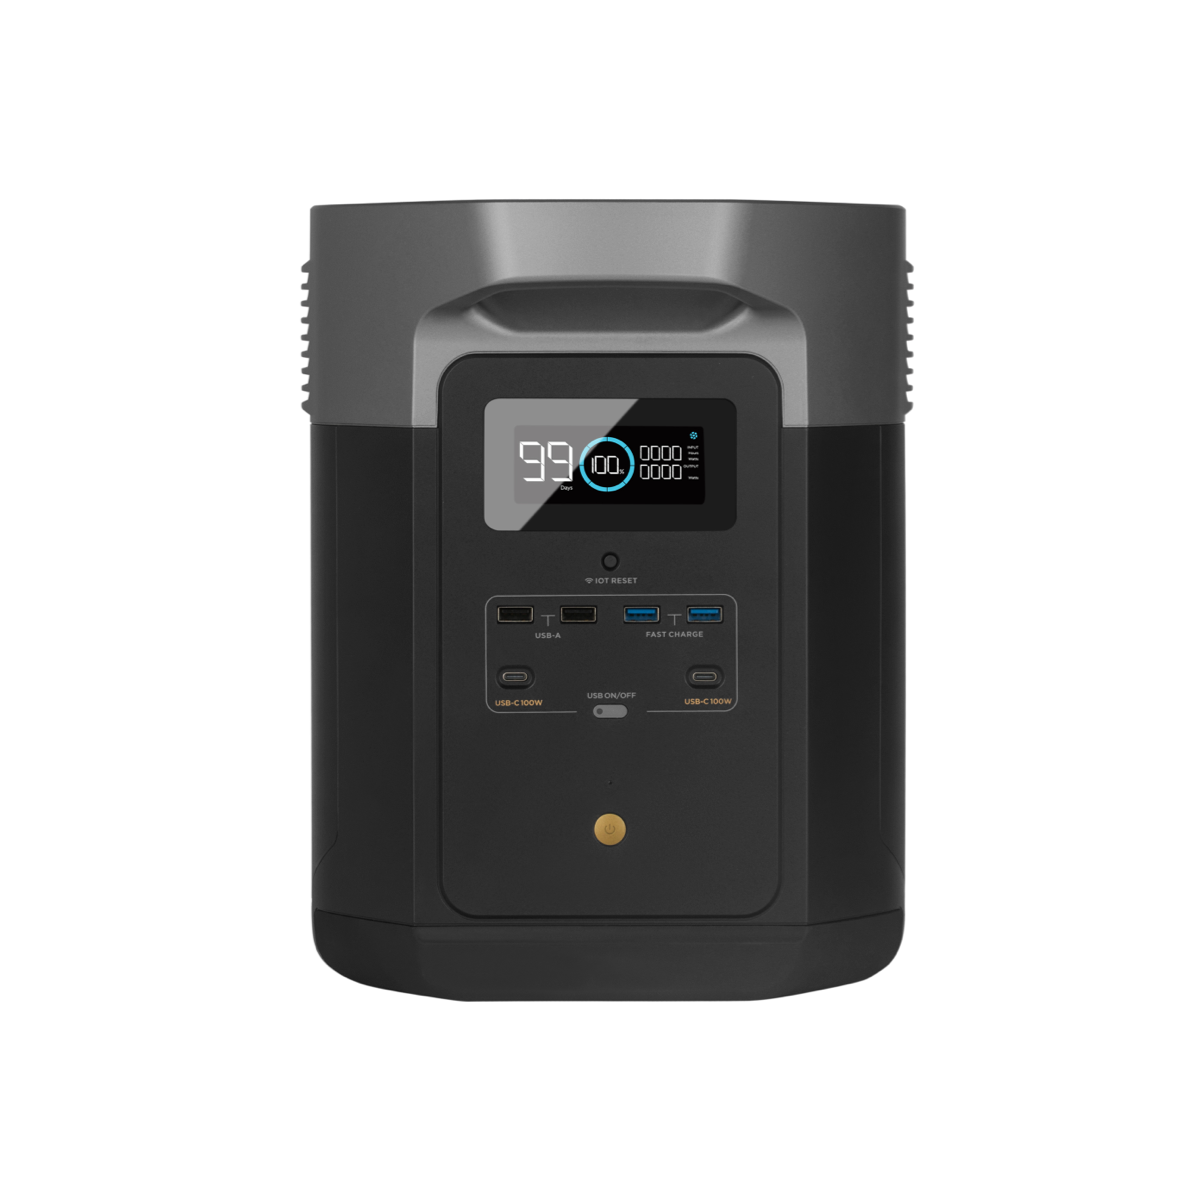 ecoflow-delta-max-1600-Smart-Solar-Batteries-Professional-Installation-Solar-Sam-Missouri-Kansas-Iowa-Illinois-Residential-Homes-Commercial-Businesses-Agricultural-Farms